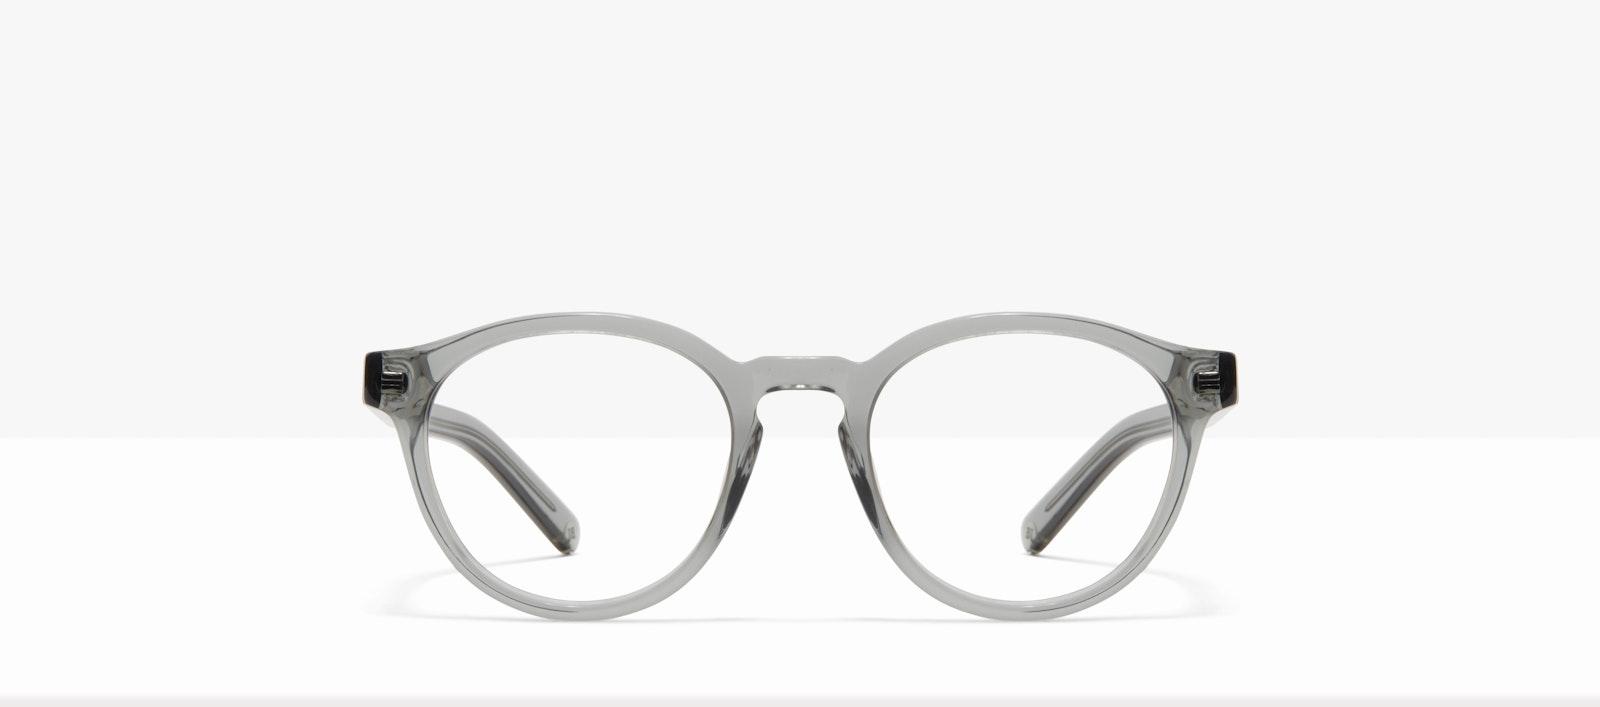 Affordable Fashion Glasses Round Eyeglasses Men Gent S Storm Front